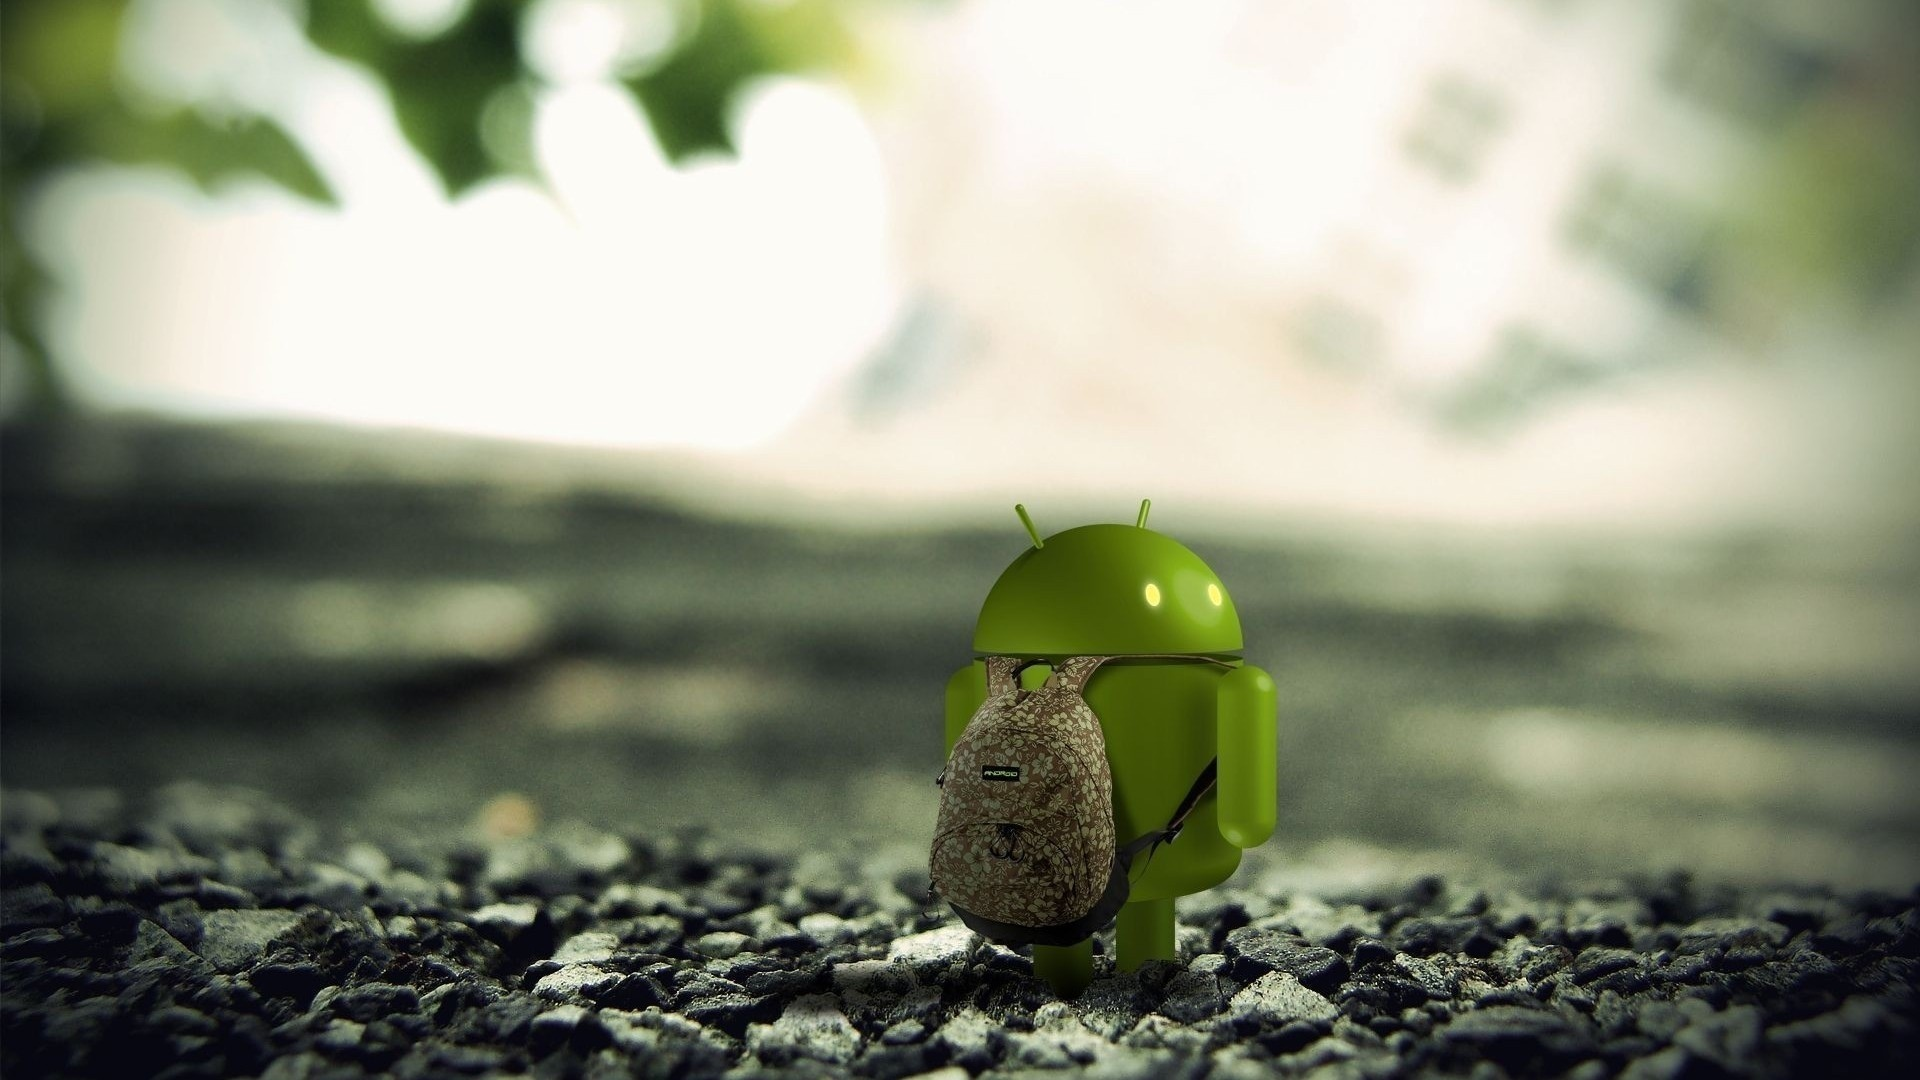 Android Hd Wallpaper - QyGjxZ